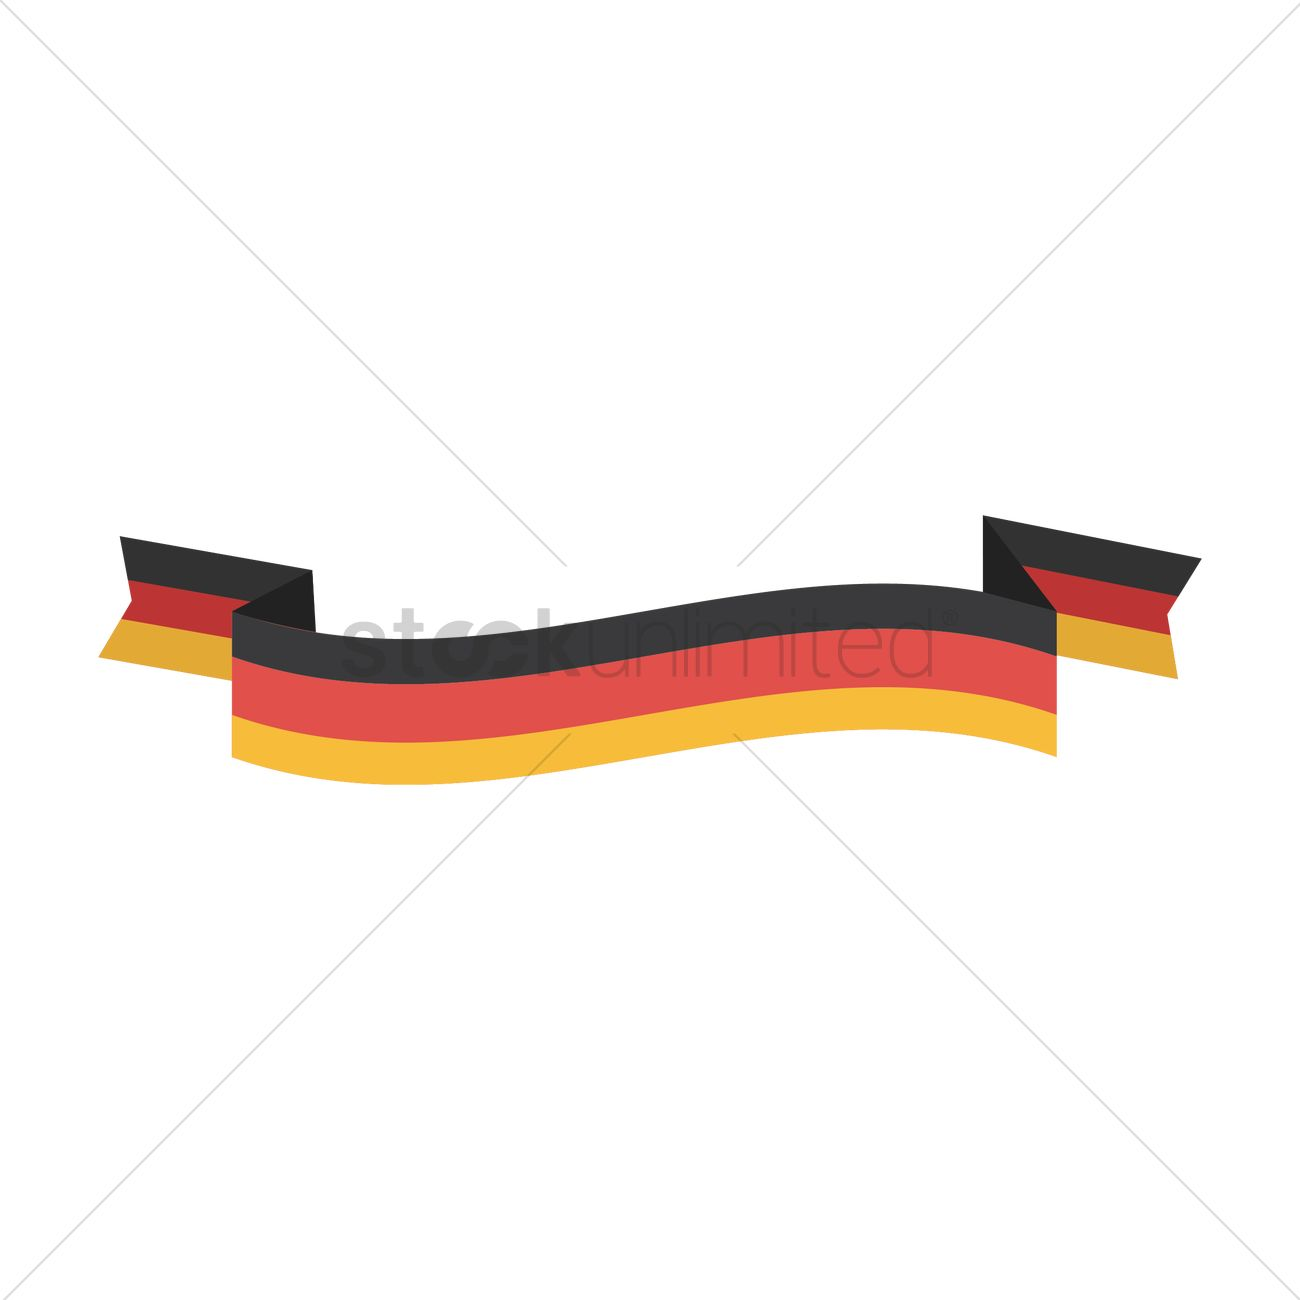 Harga Jual Flag Banner Update 2018 New Vario 110 Esp Cbs Estilo Black Kebumen Patriotic Cliparts Free Download Best 1300x1300 Banners Design Designs Pattern Patterns Germany Flags